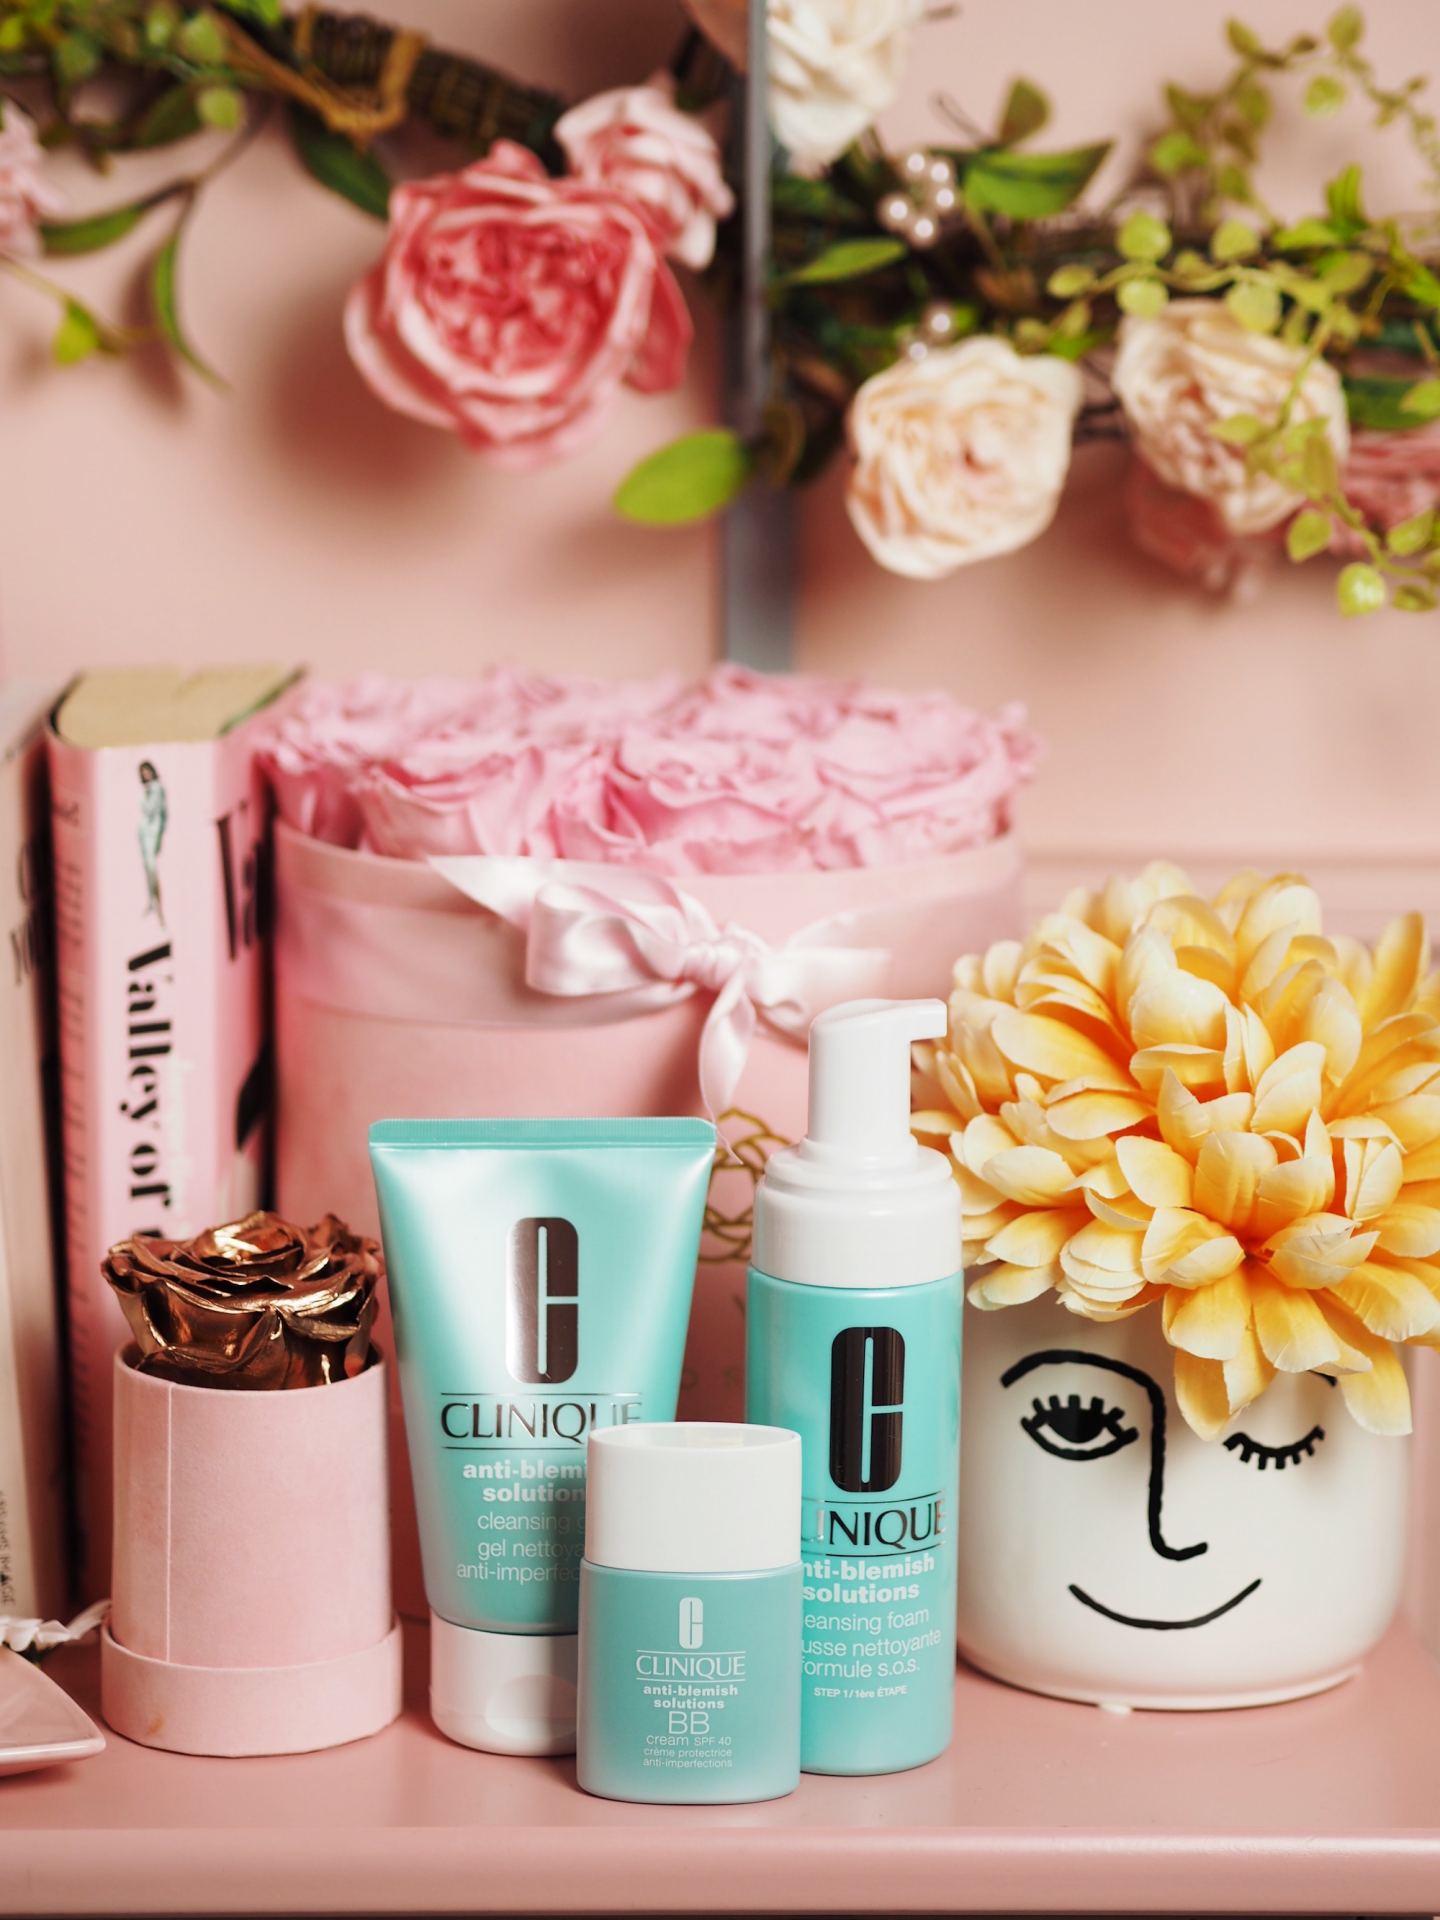 Clinique Anti-Blemish Skincare Collection